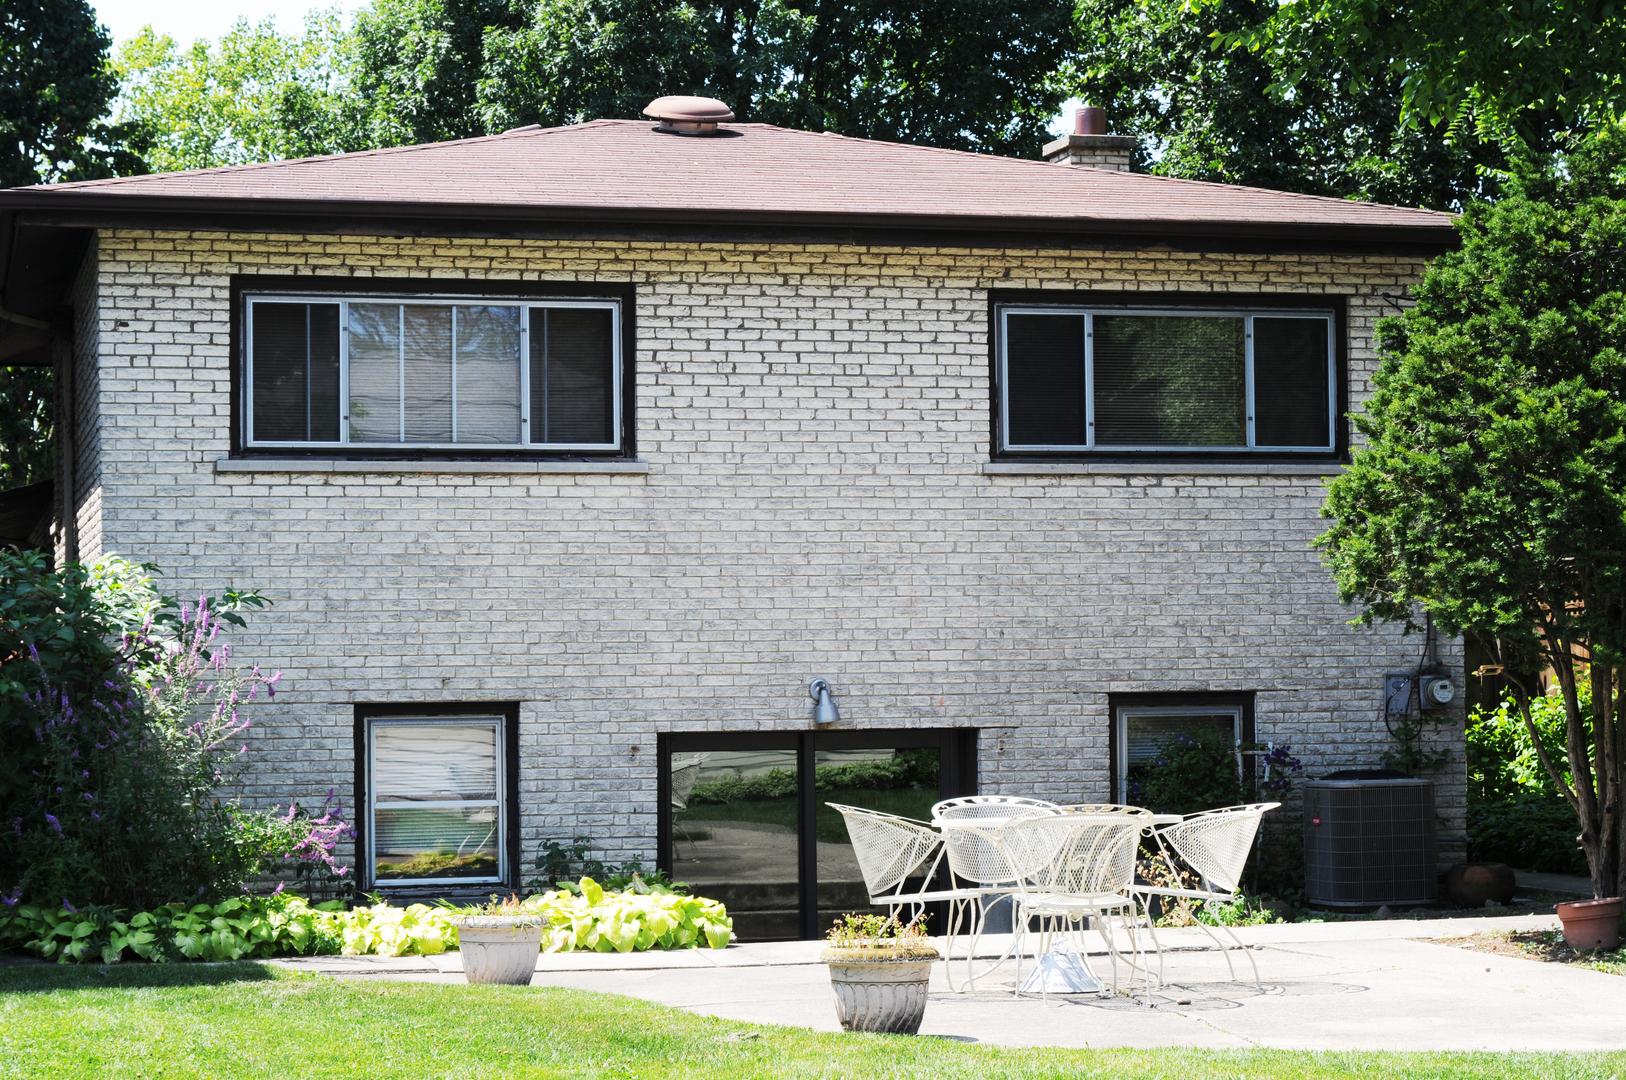 228 North Harvey, Oak Park, Illinois, 60302